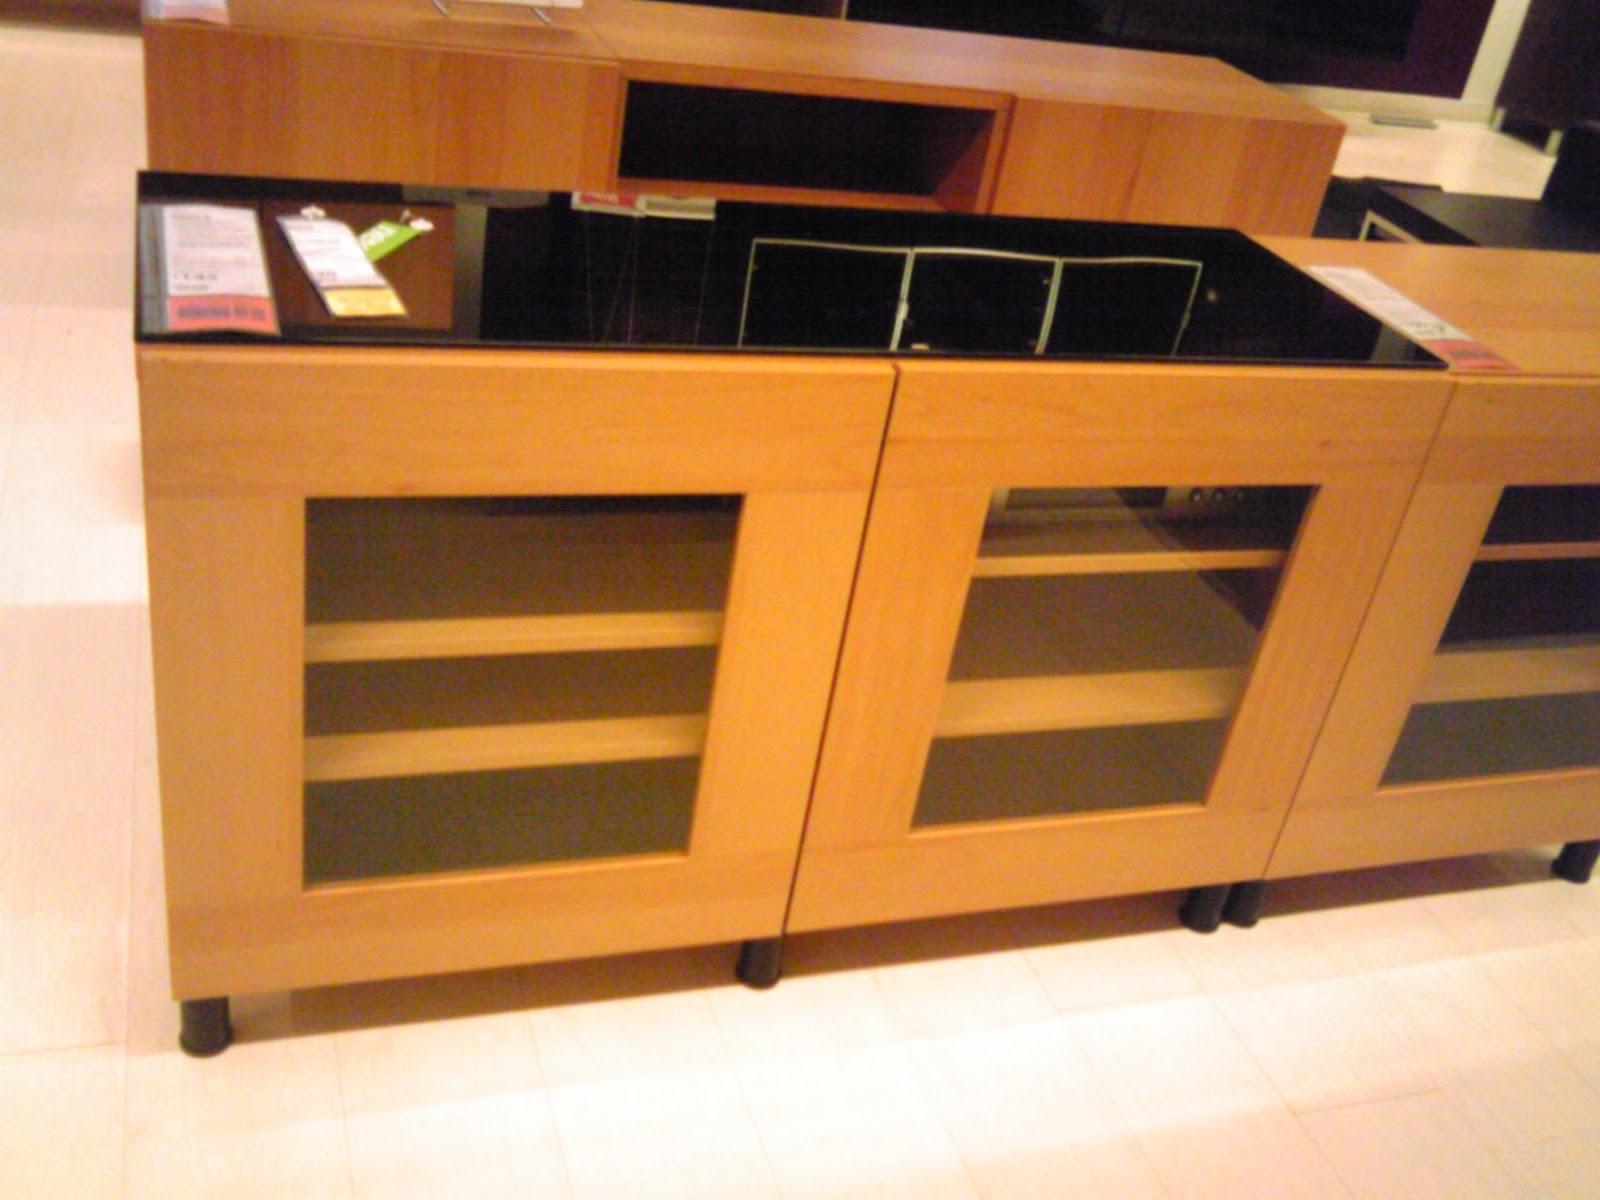 Ikea Meuble Tv Roulettes Free Meuble Tv Bas A Roulette Ikea  # Meuble Tv Sur Roulettes First Plexiglass